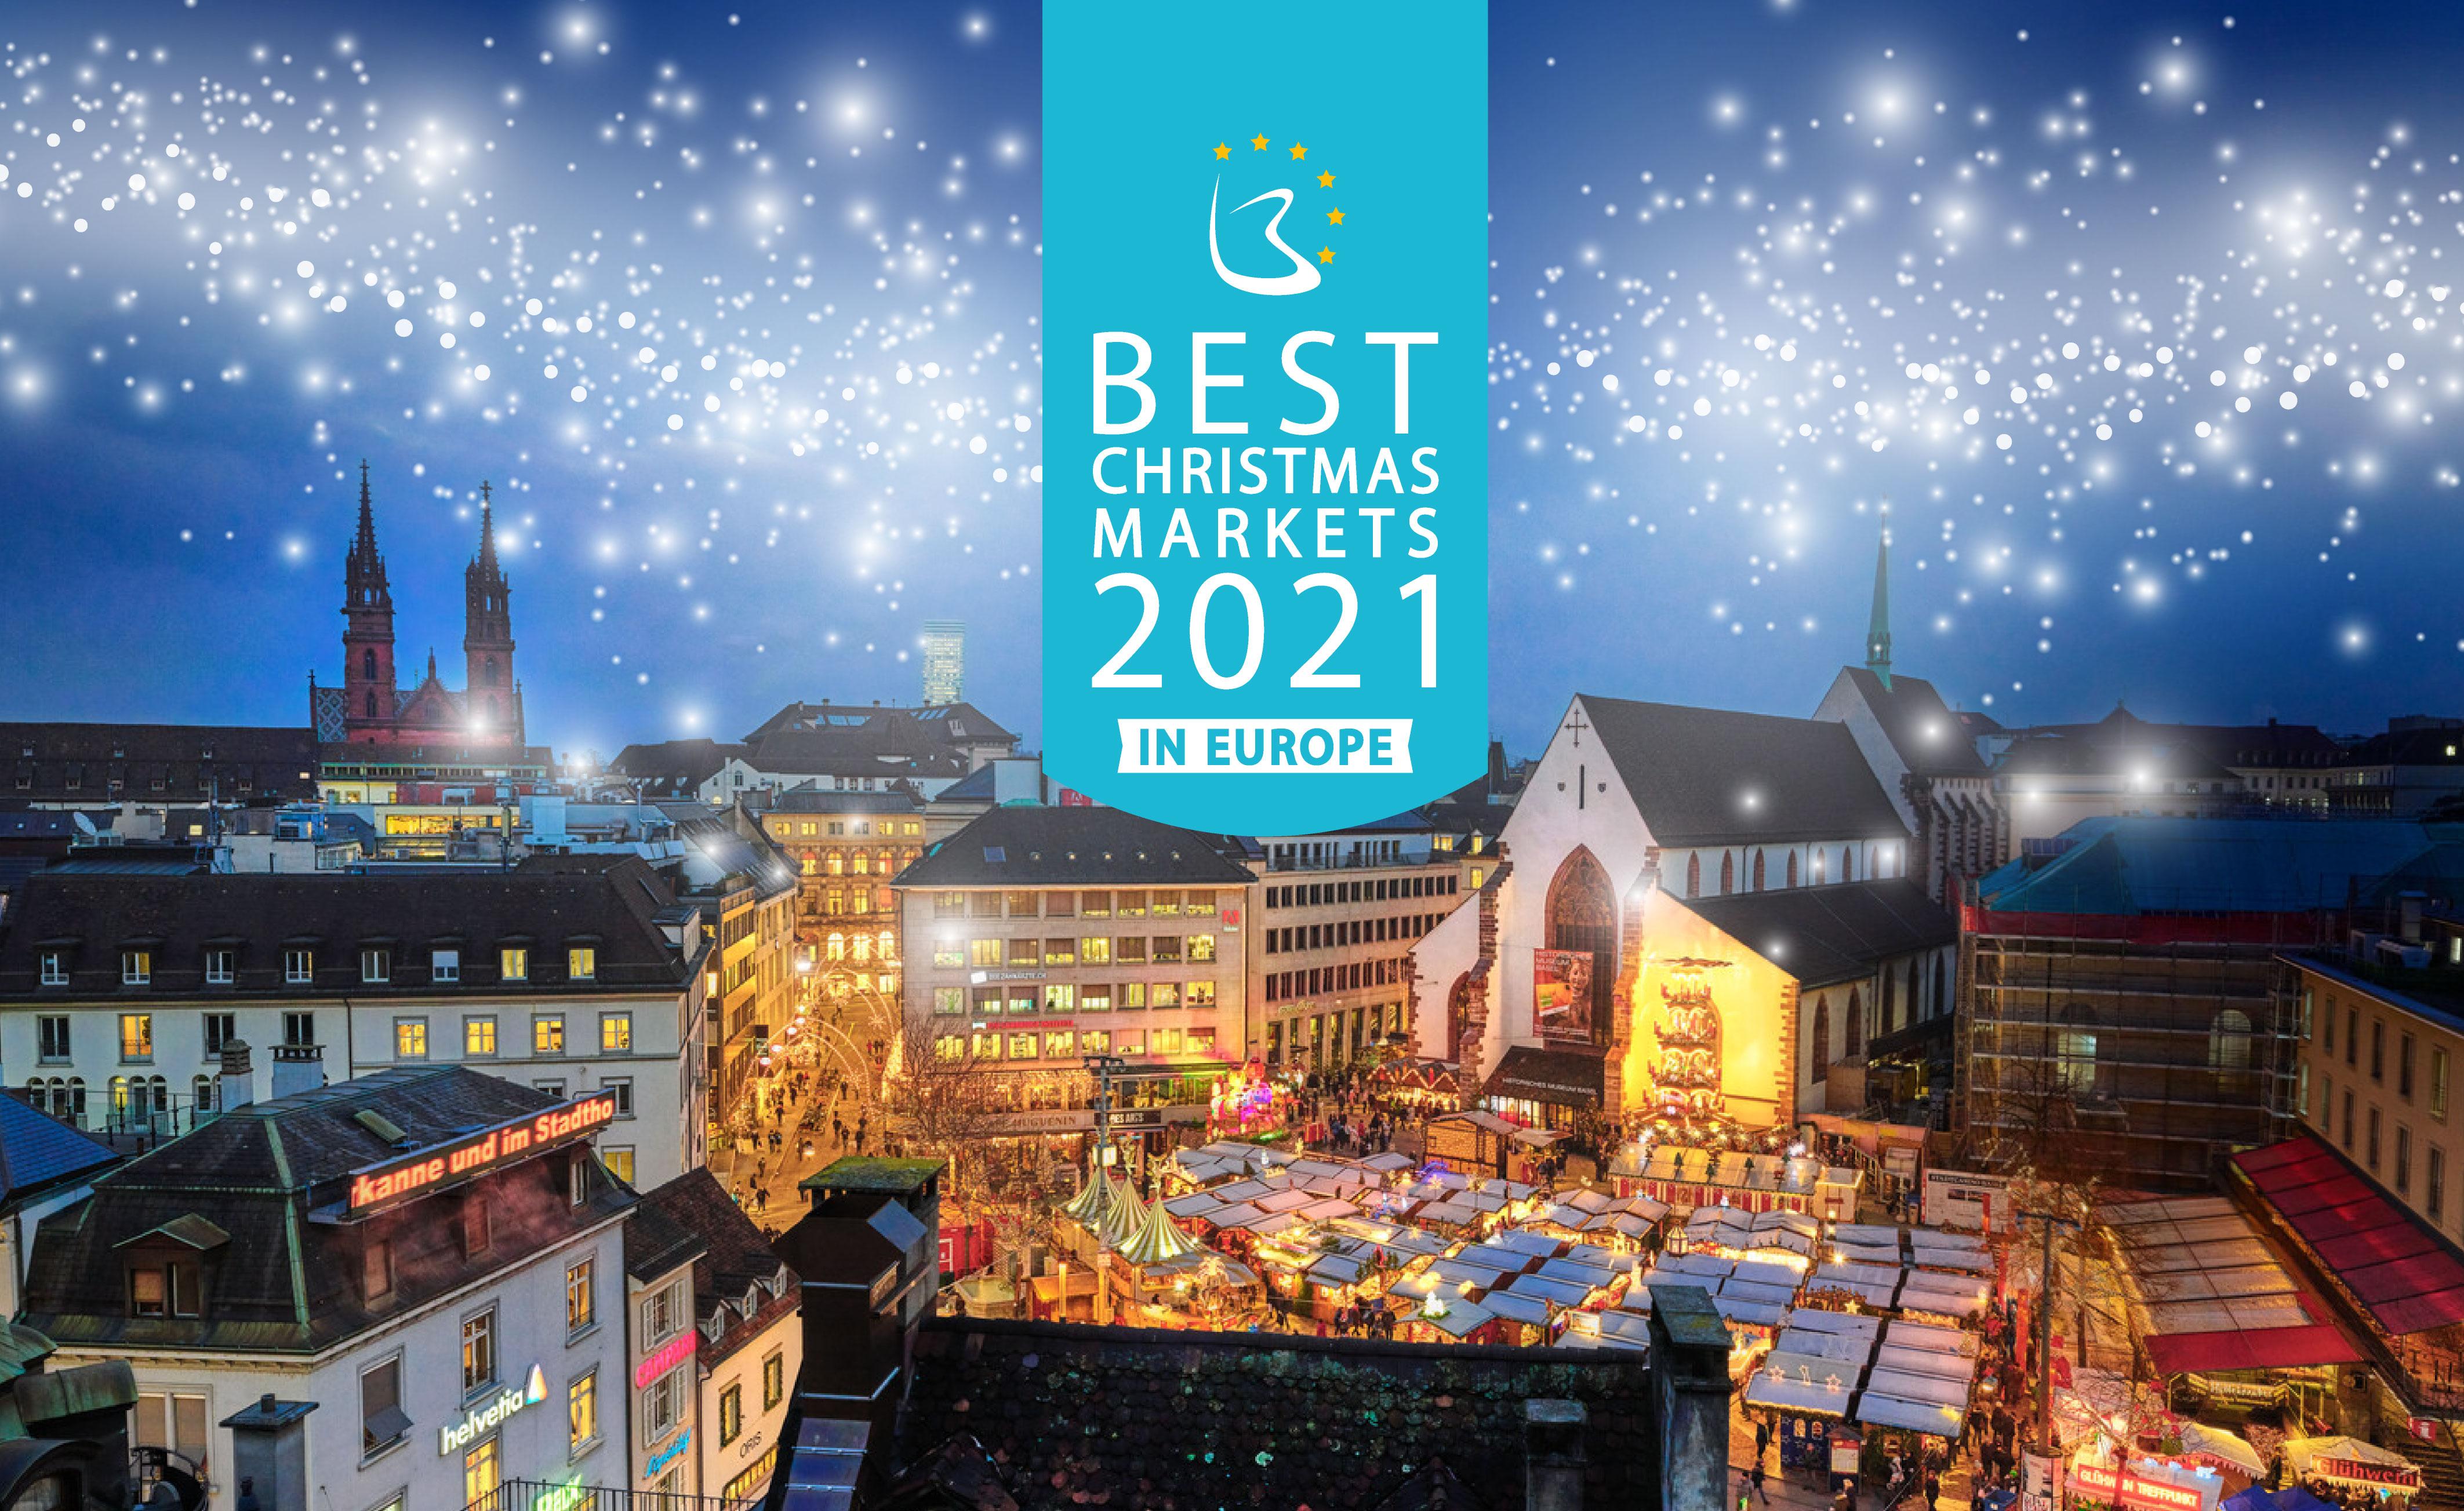 Christmas Market Amsterdam 2021 Best Christmas Markets In Europe 2021 Europe S Best Destinations